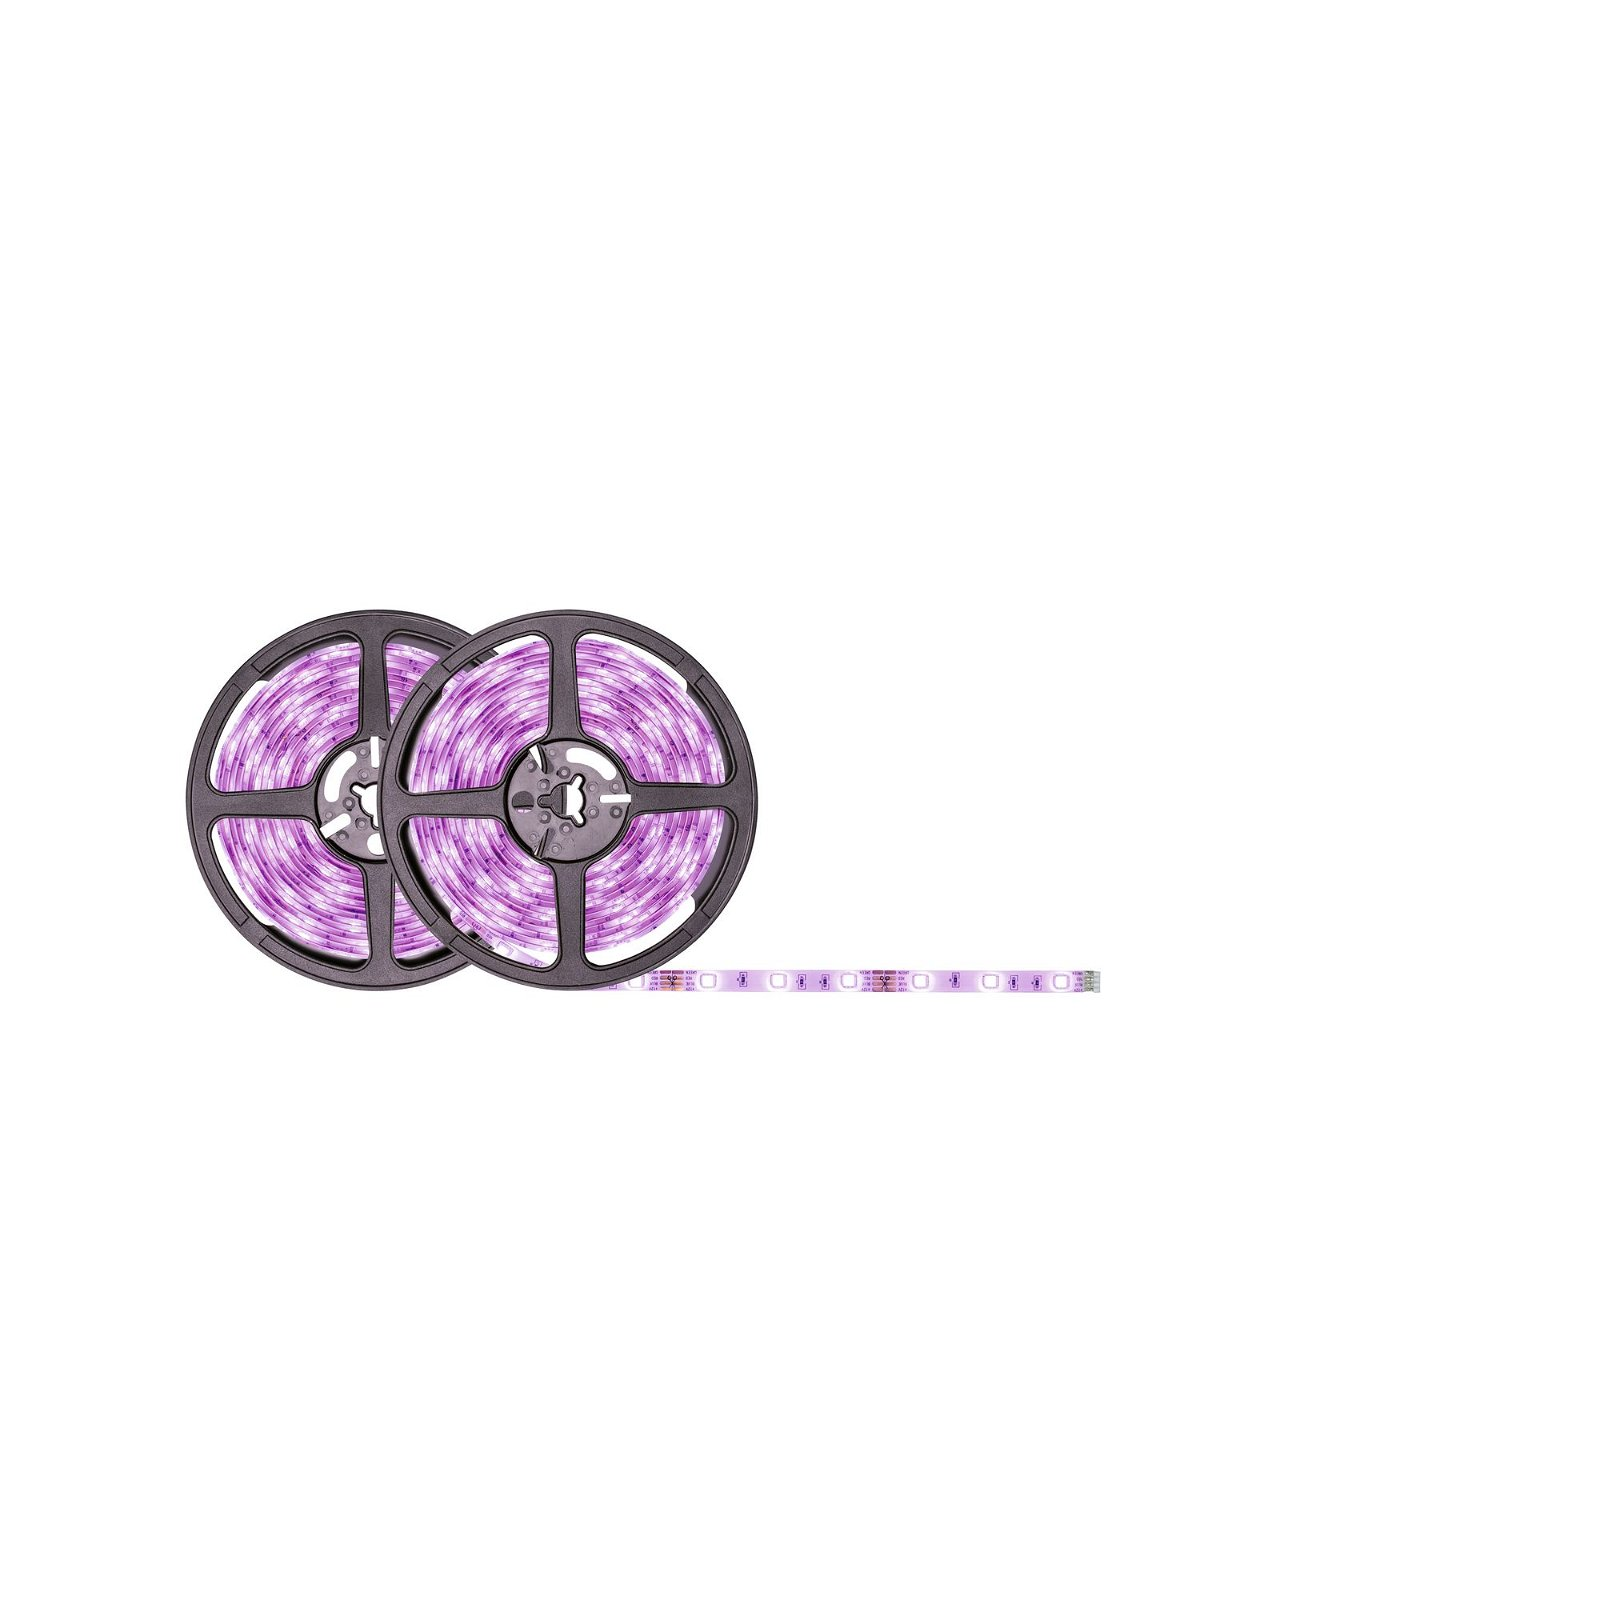 SimpLED LED Strip RGB 10m beschichtet 28W 101lm/m RGB 36VA